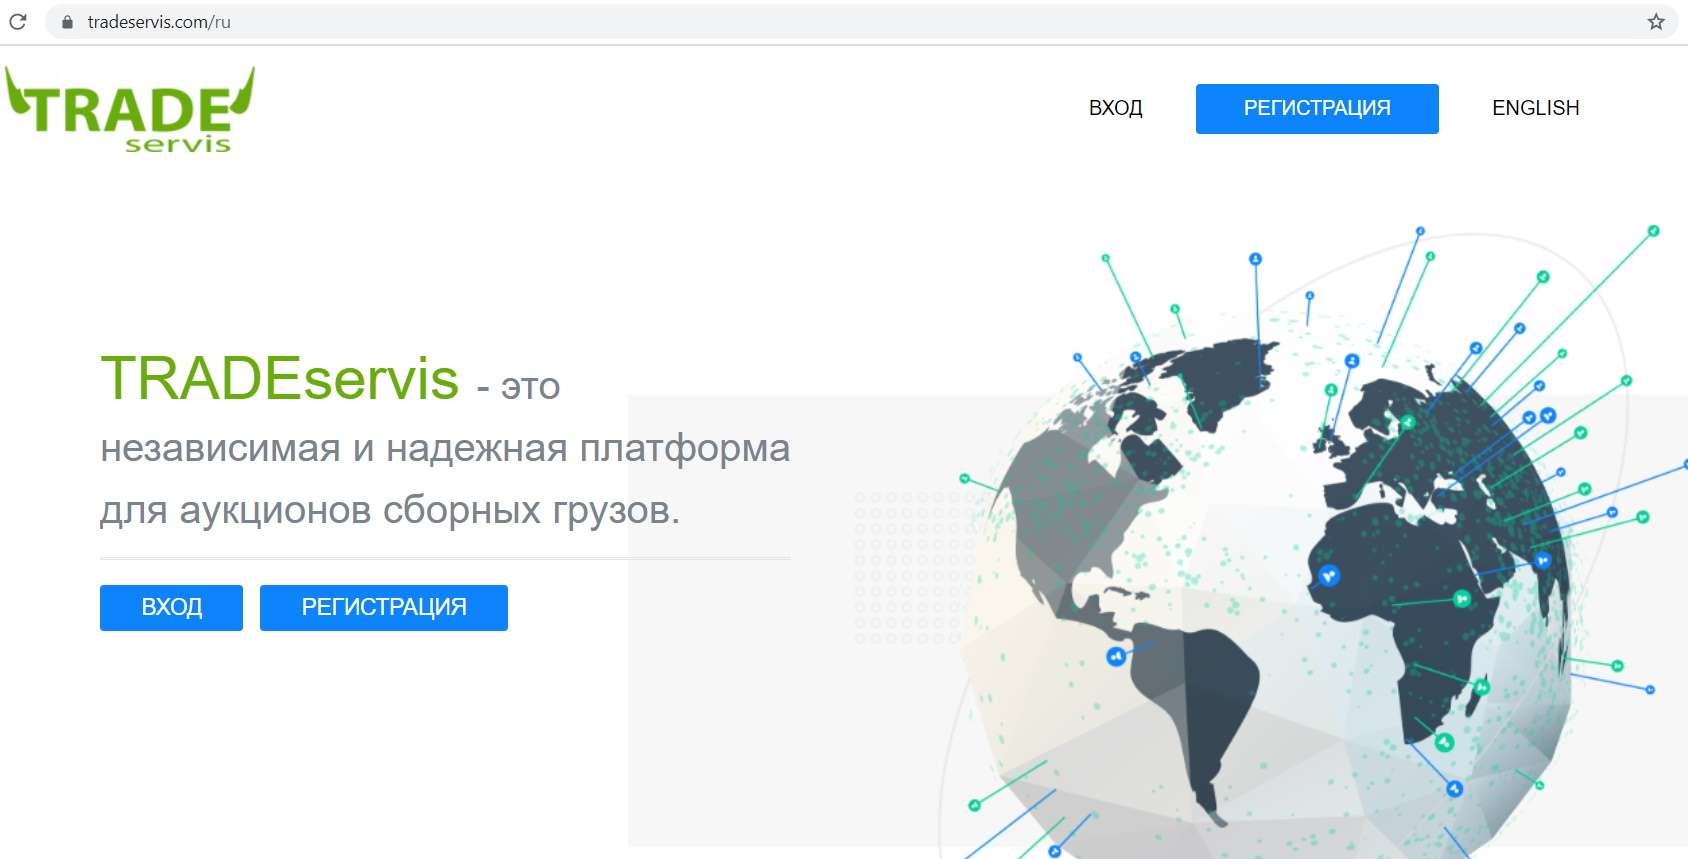 Главная страница сайта tradeservis.com